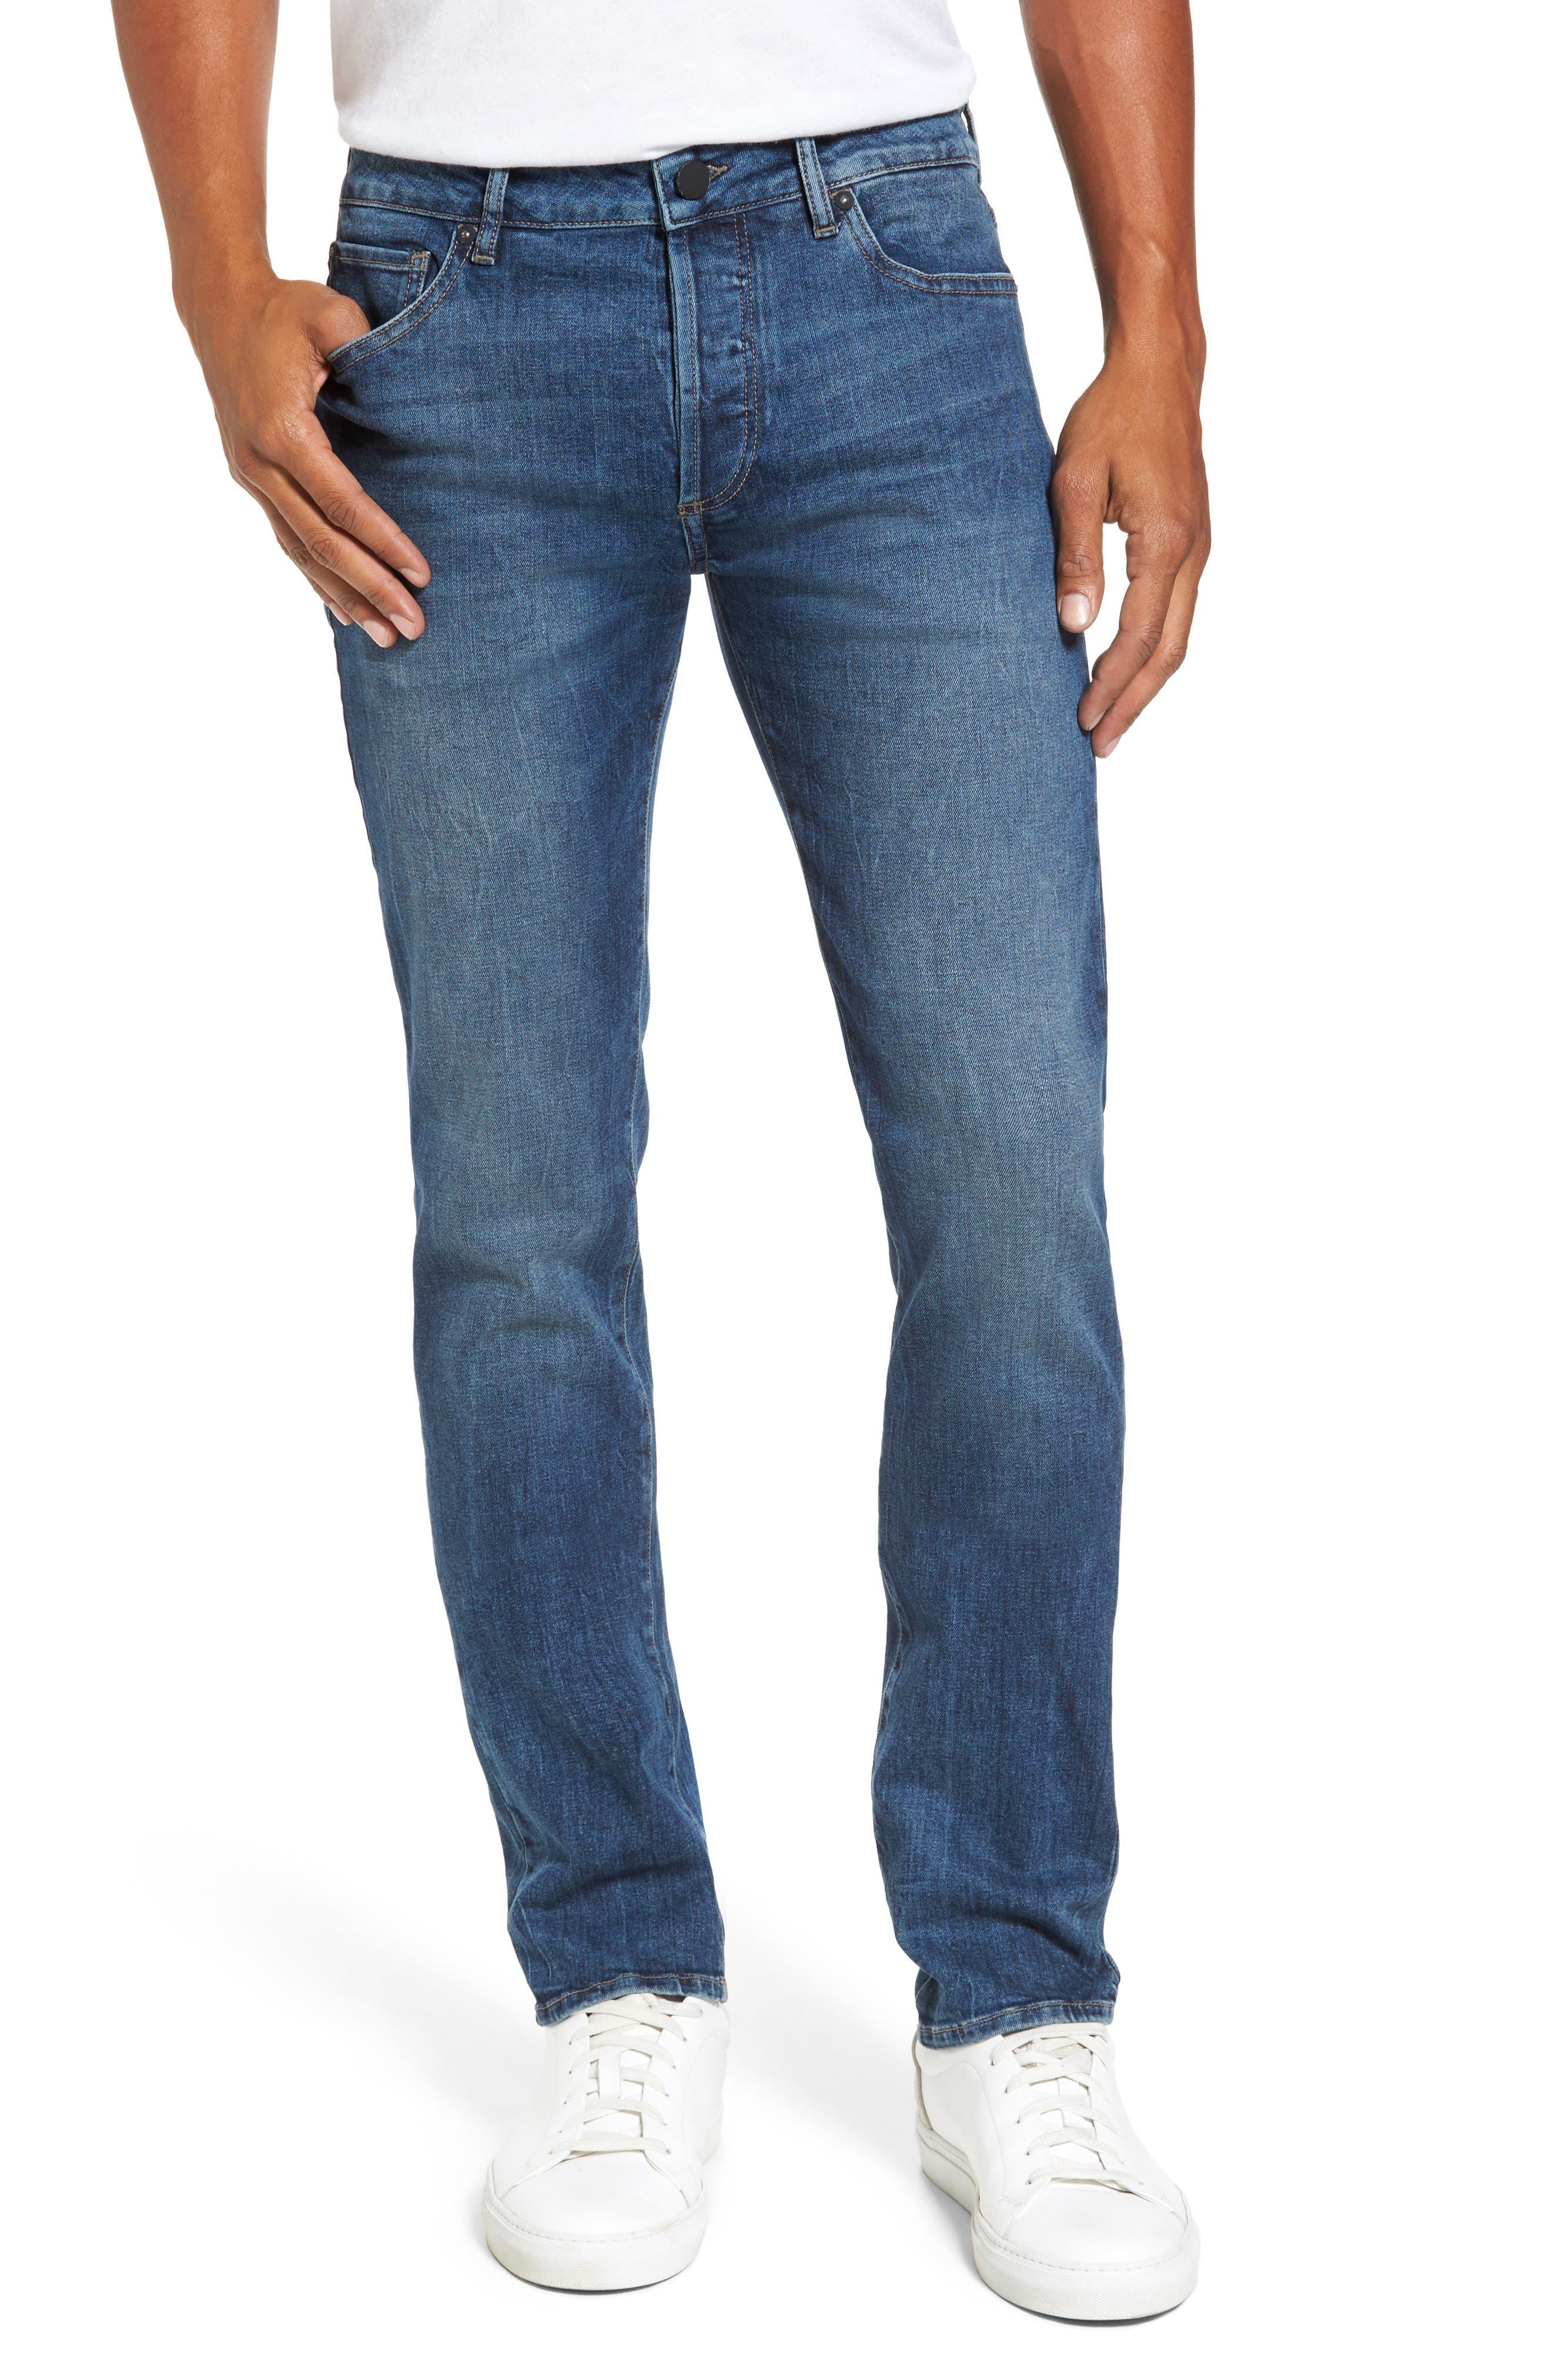 Alternate Image 1 Selected - DL1961 Nick Slim Fit Jeans (Civil)